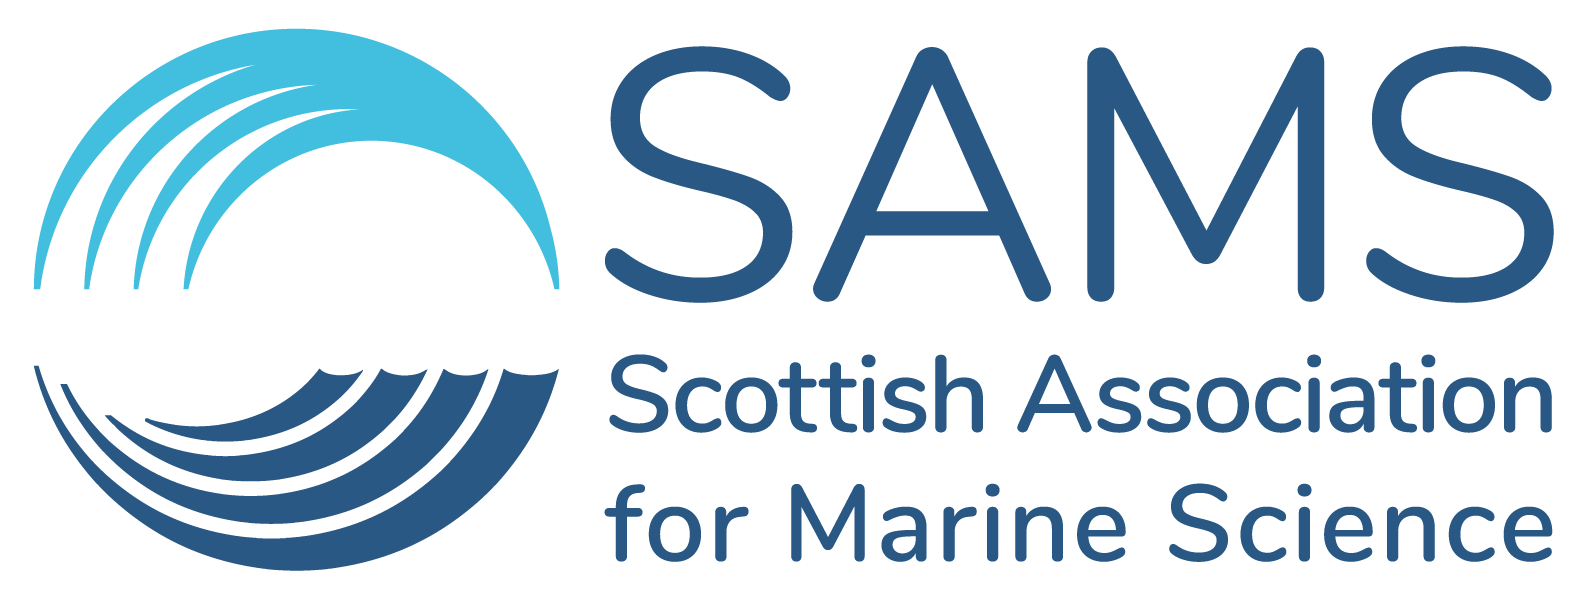 Scottish Association for Marine Science (SAMS)